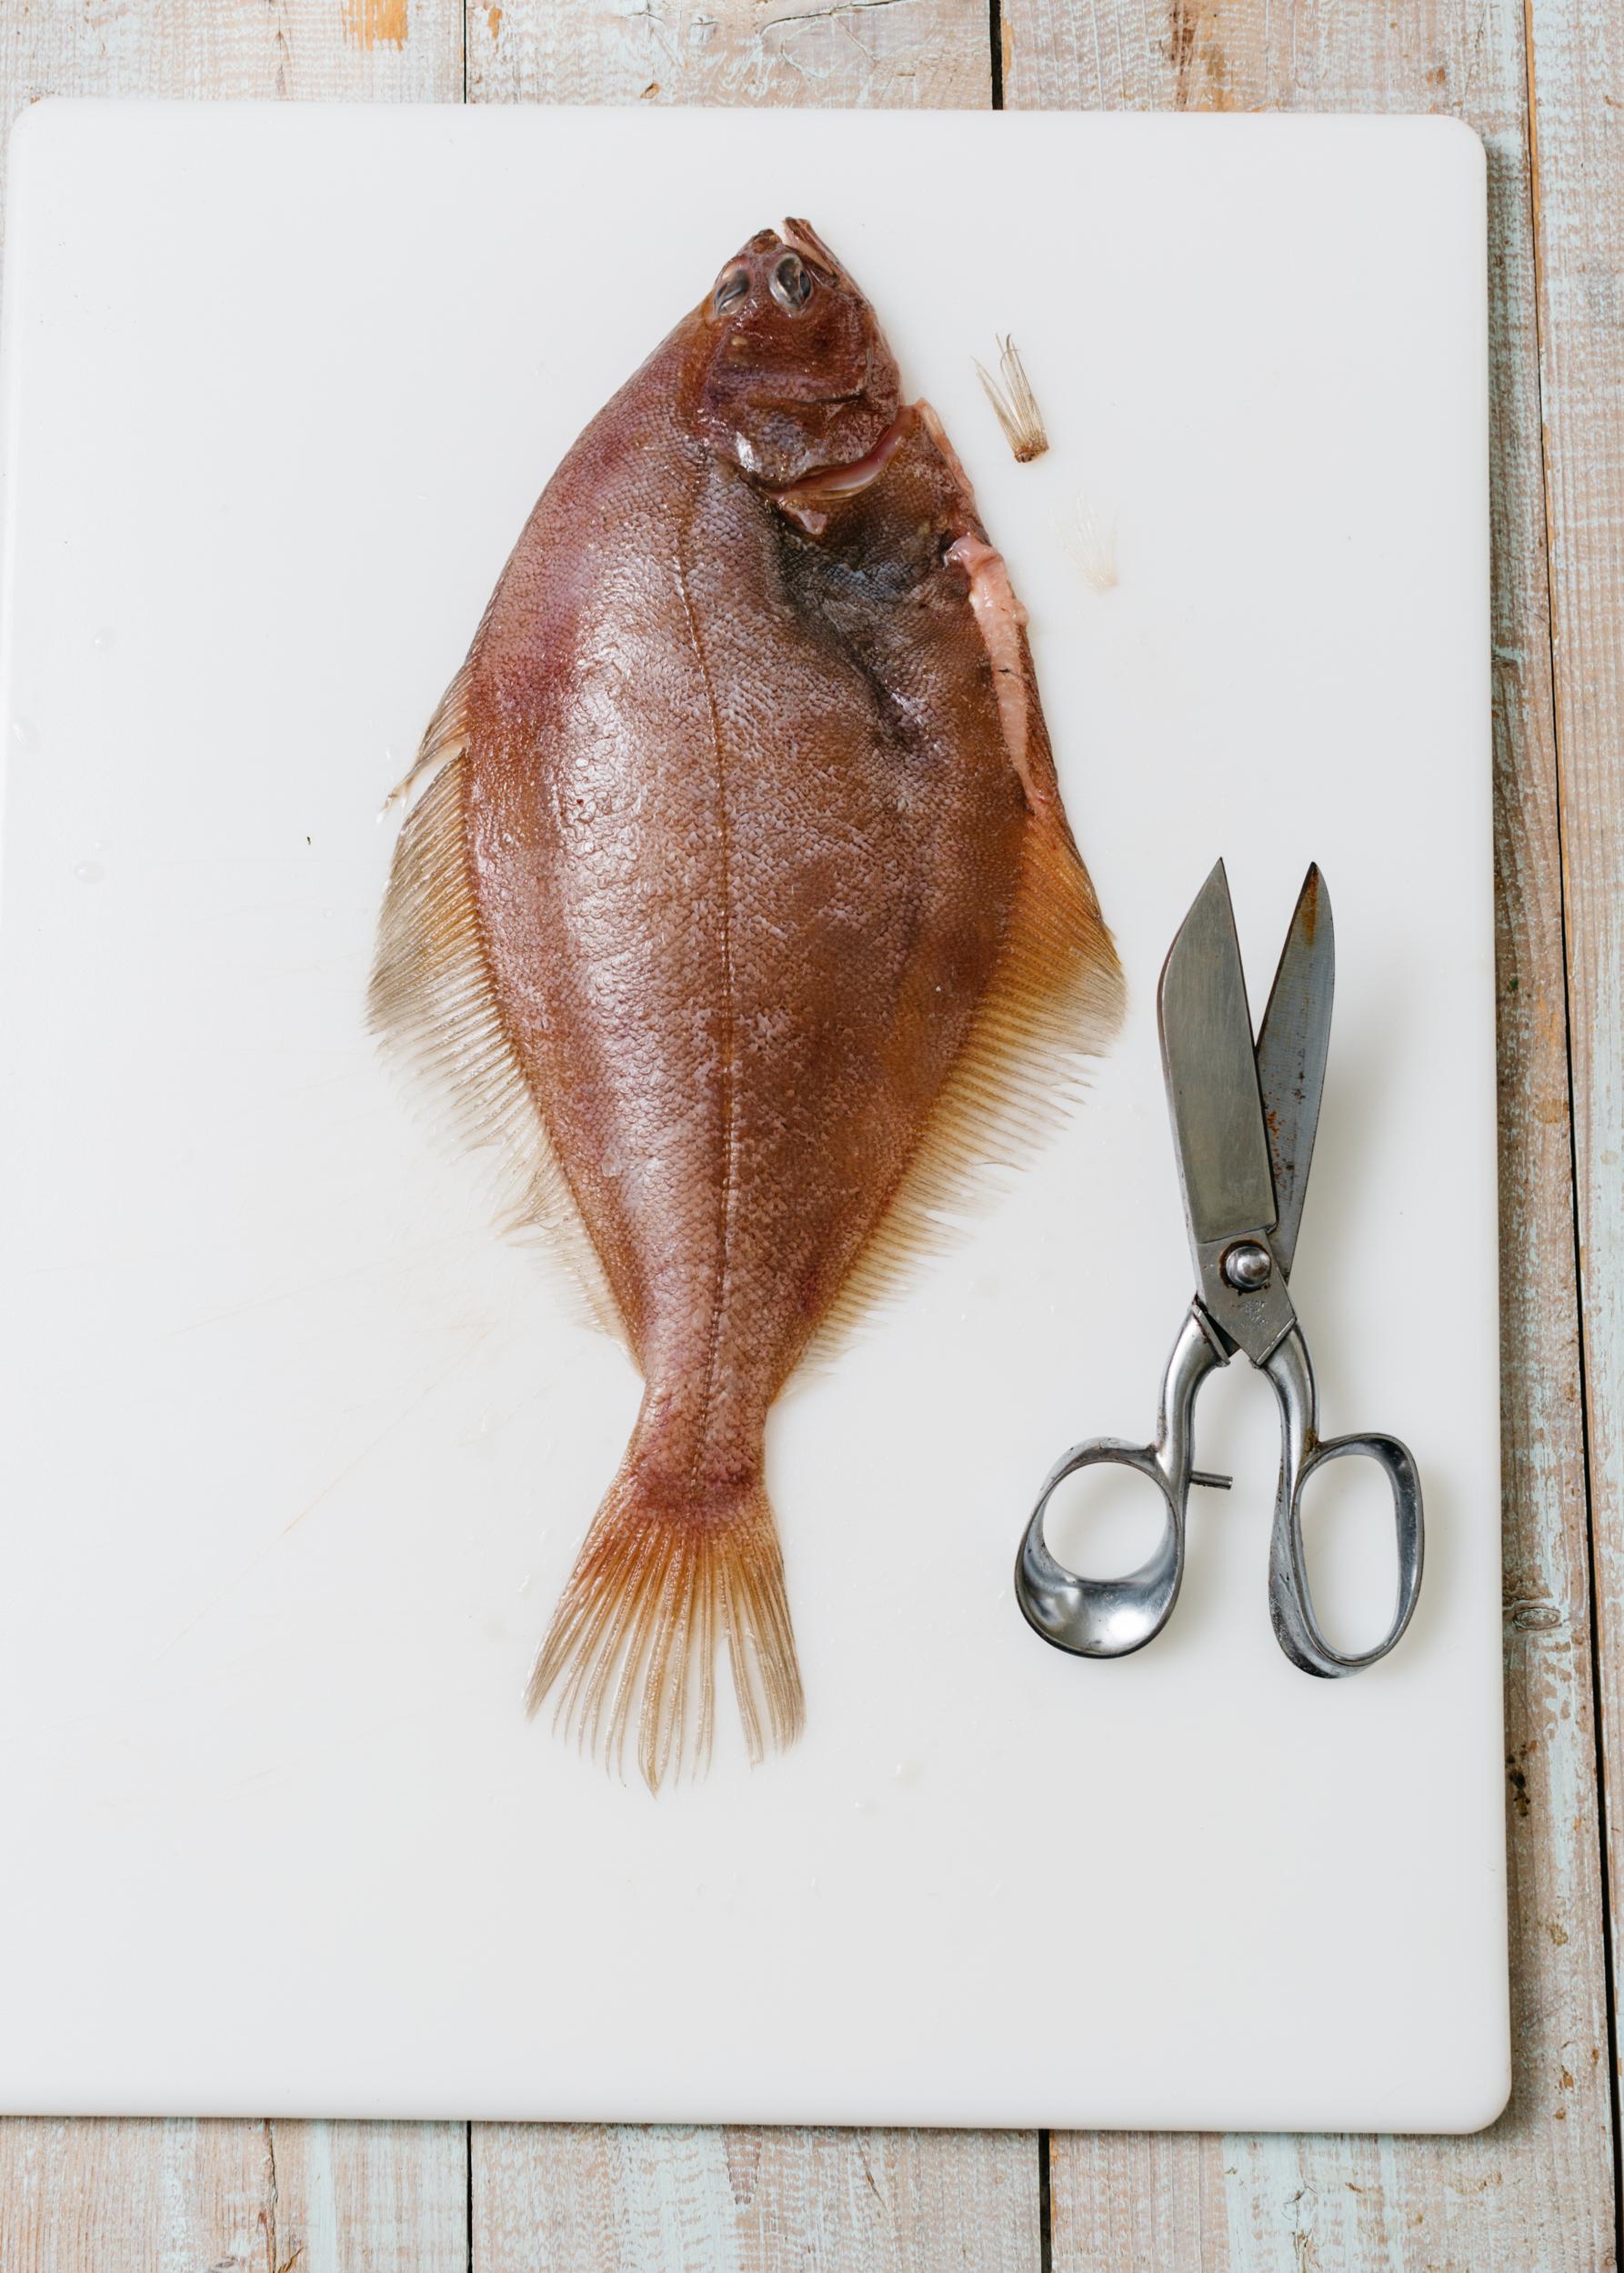 Flounder_Fennel-3475_WEB.jpg